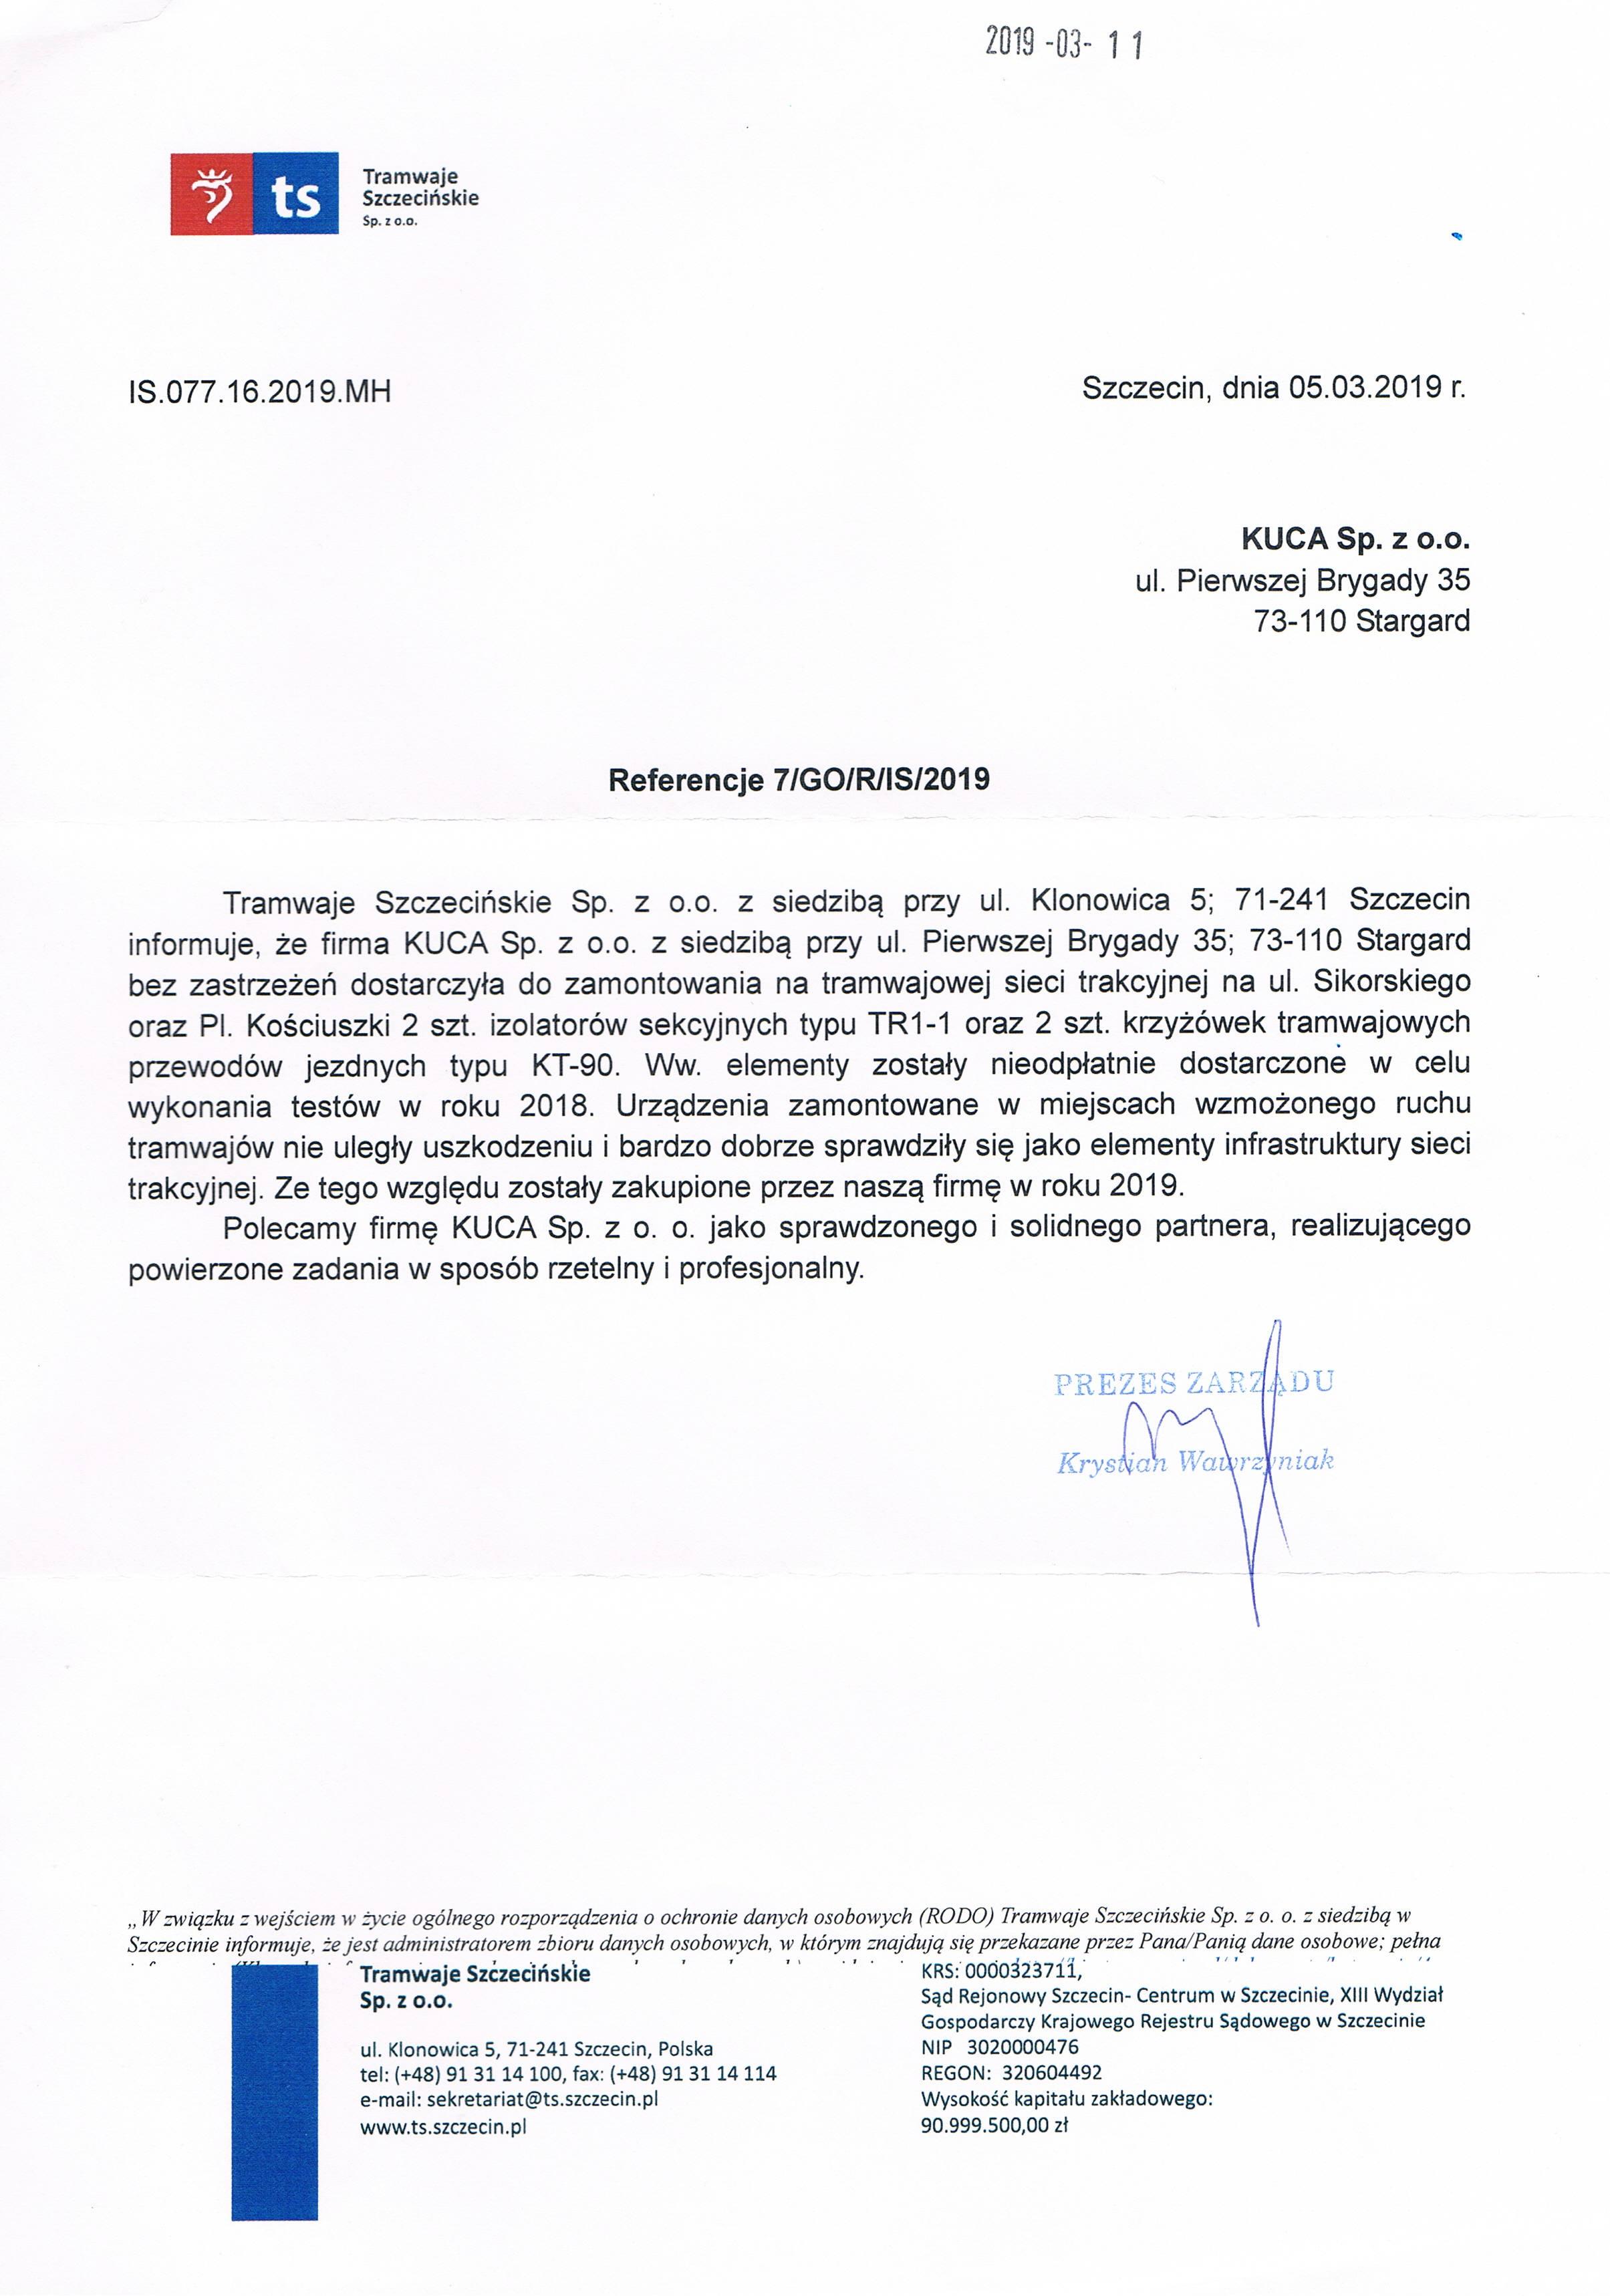 Referencje TSz 05.03.2019